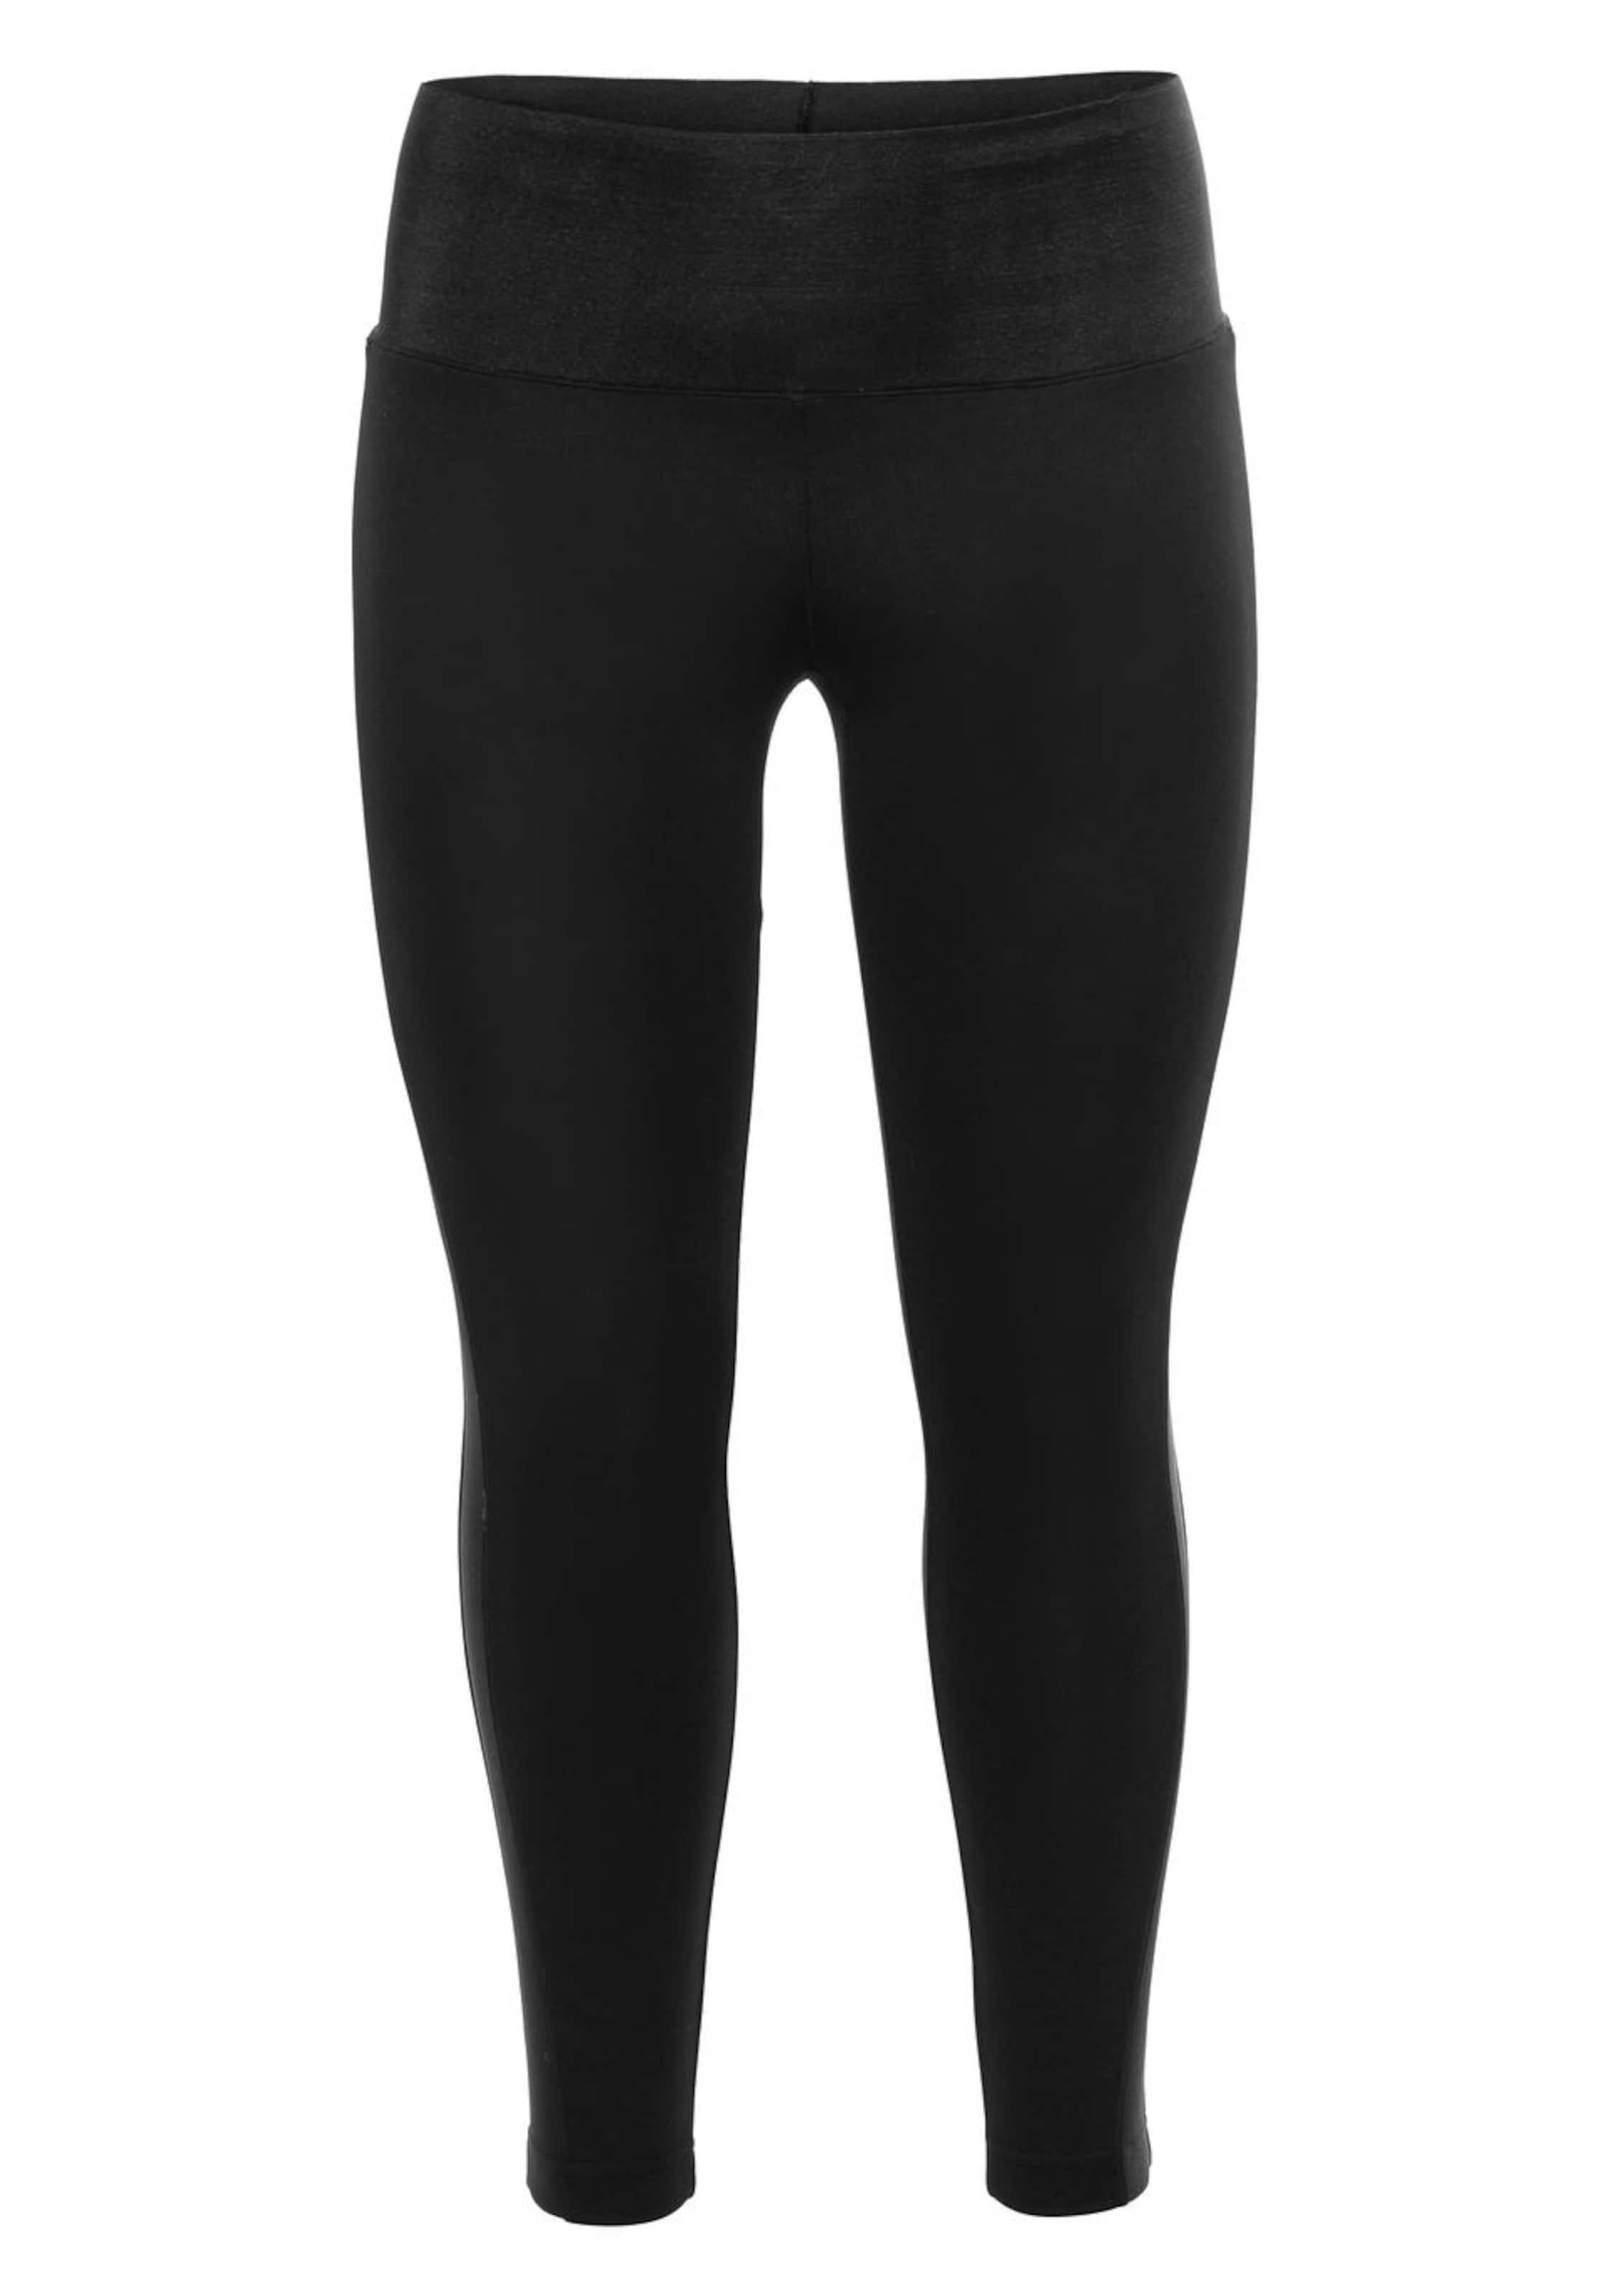 Sheego Style Schwarz Leggings In Style In Leggings Sheego WeDIYH9E2